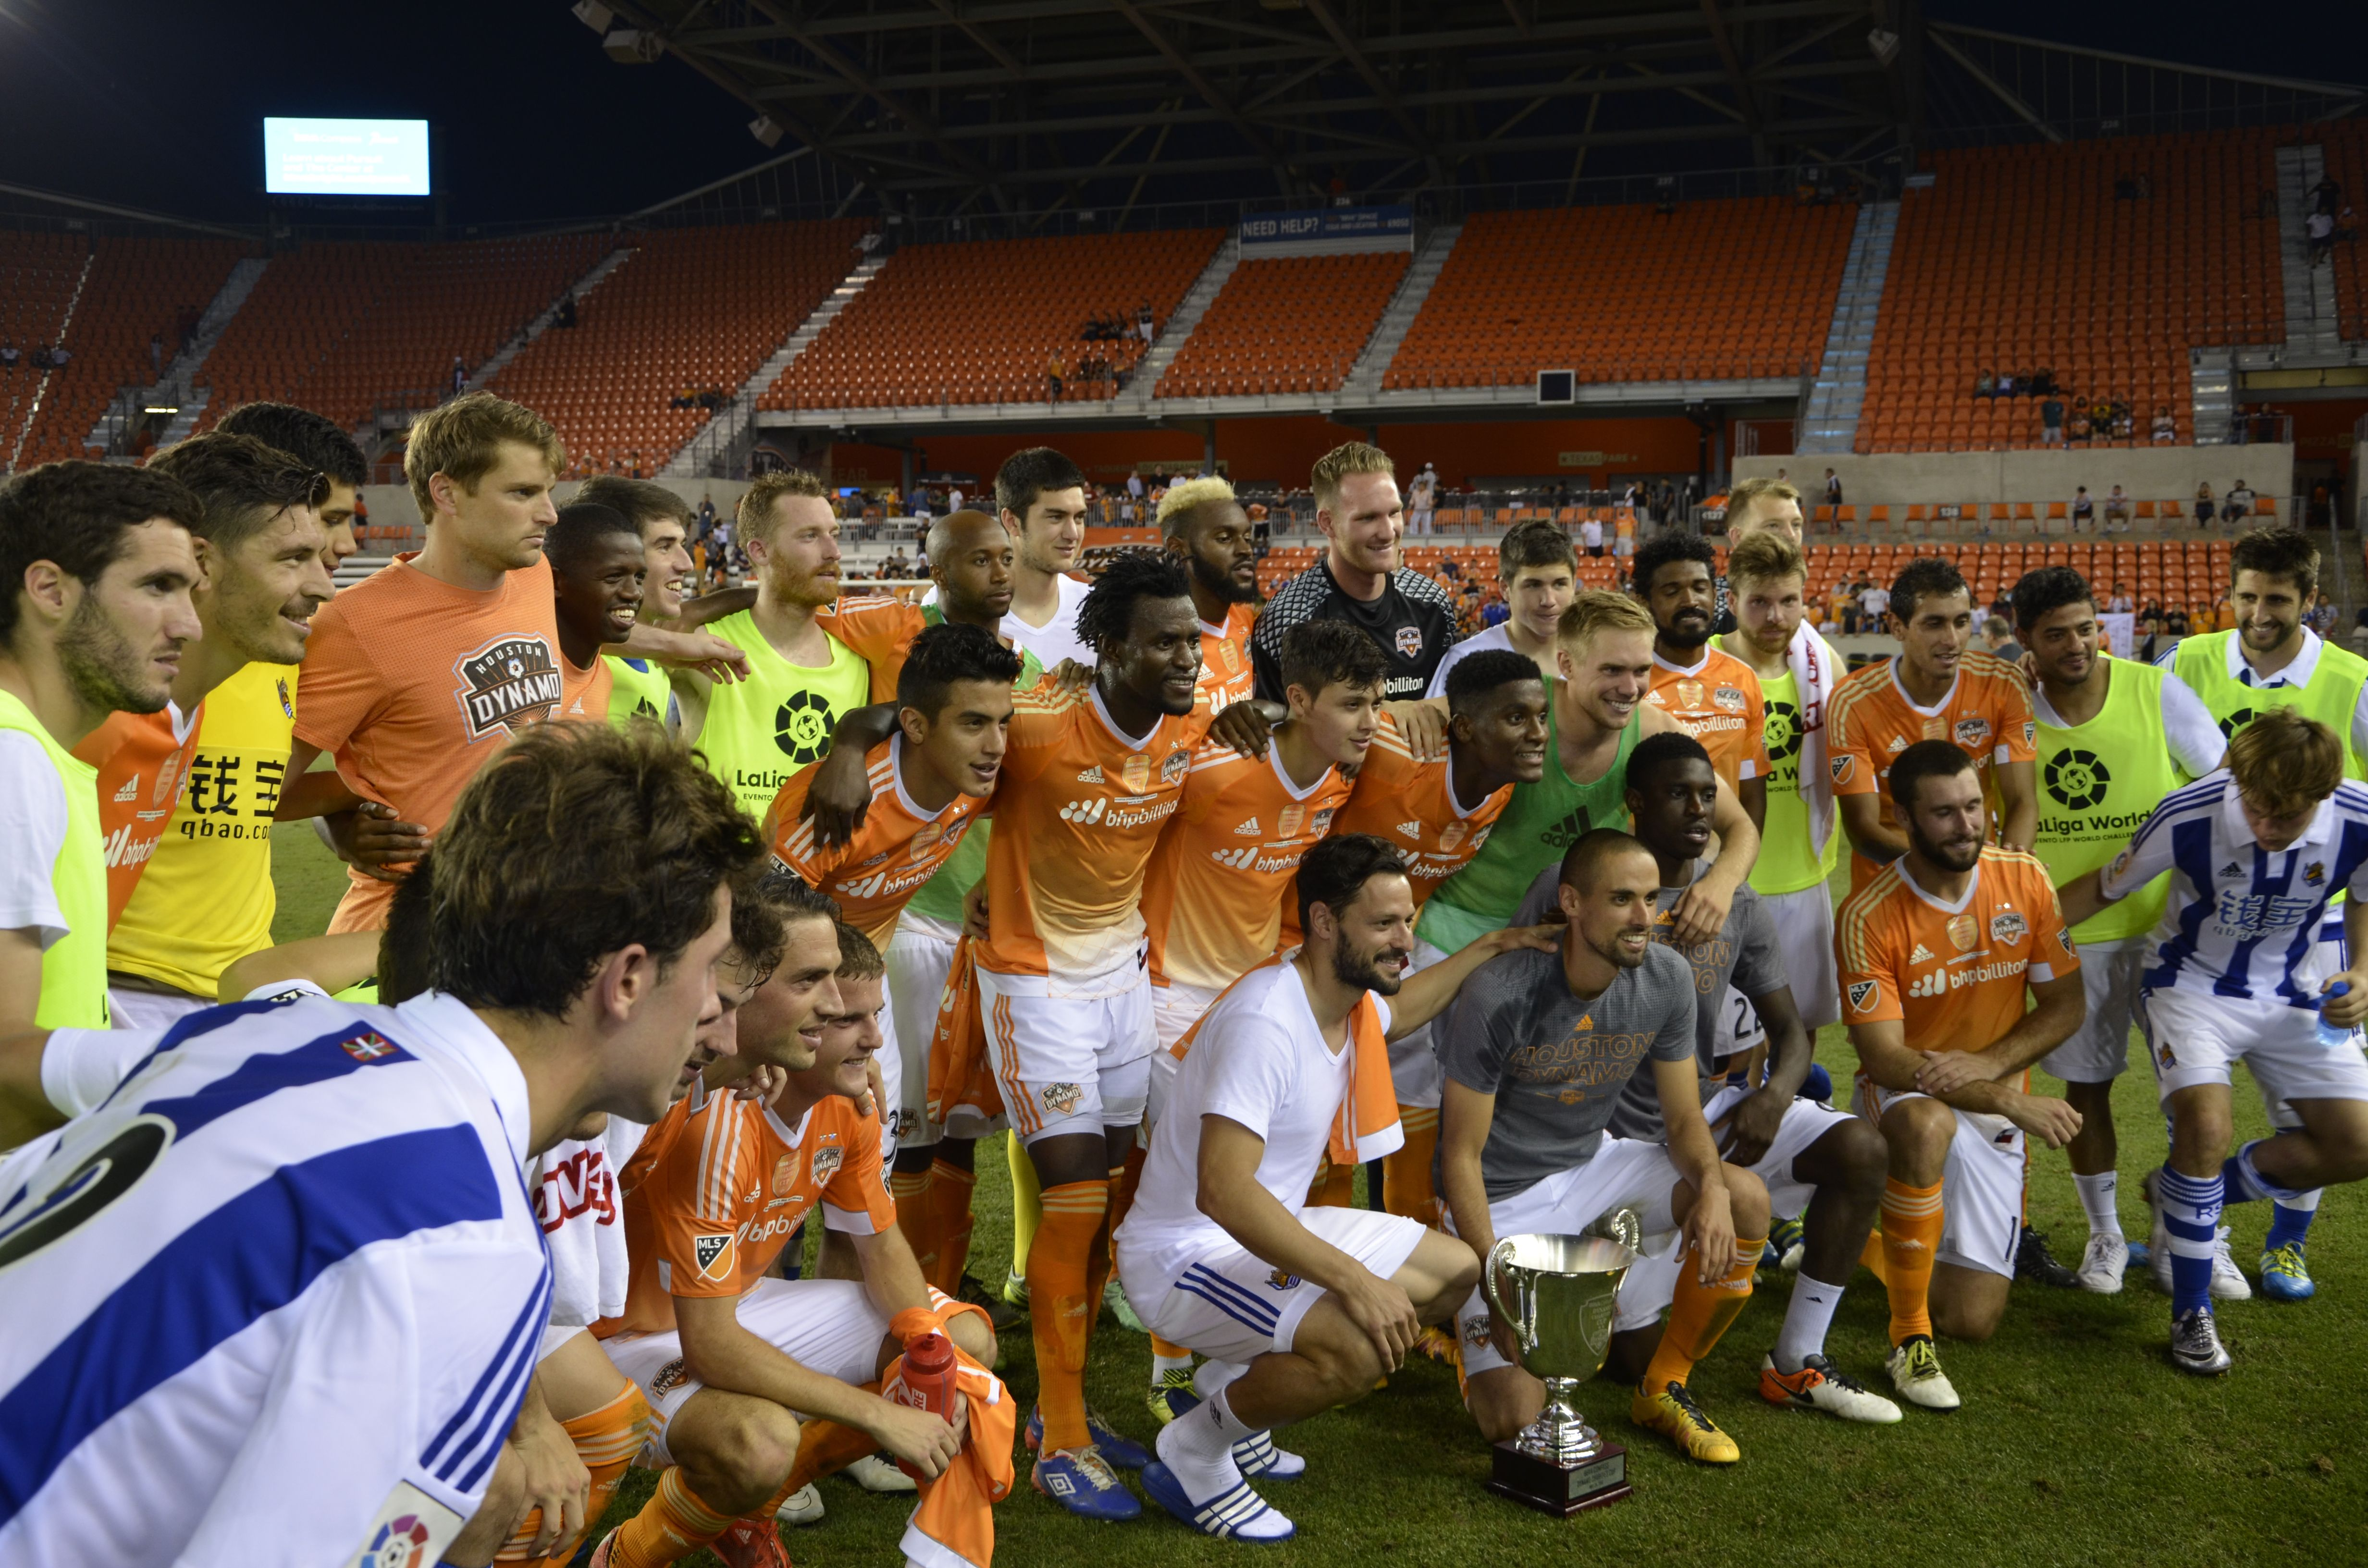 Houston Top Real Sociedad in Dynamo Charities Cup